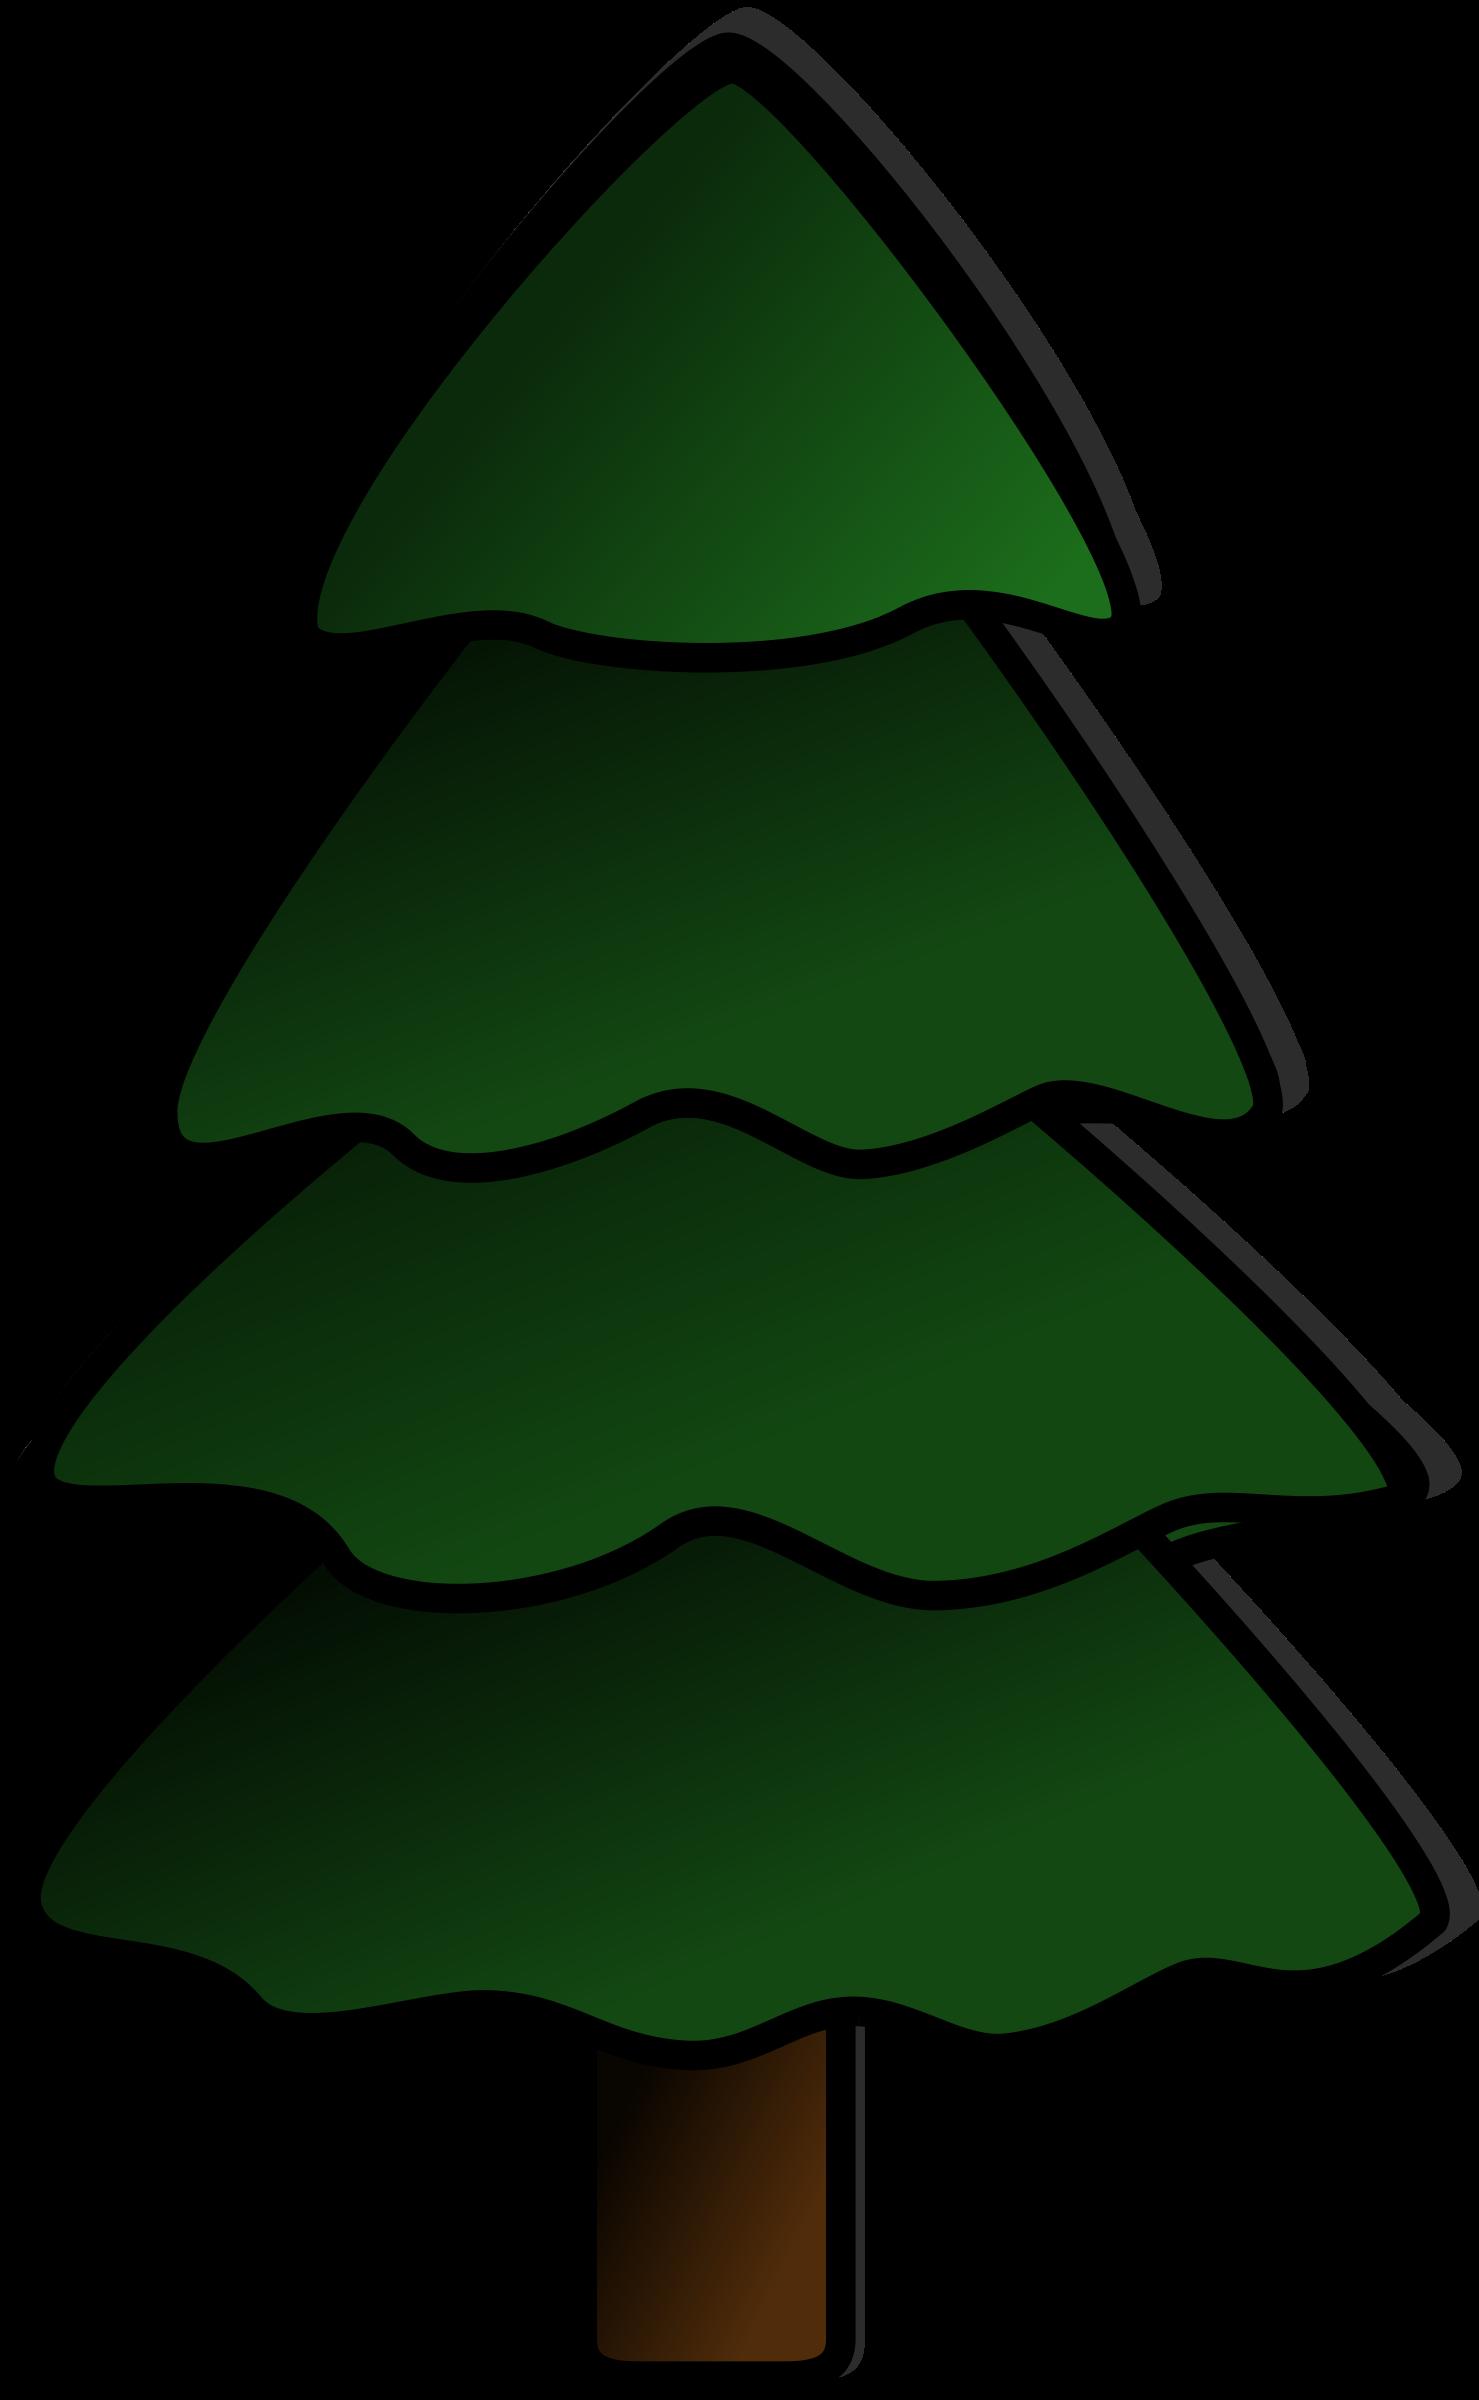 Pine Tree Clip Art. Clip Art. Ourcommunitymedia Free Clip Art Images.